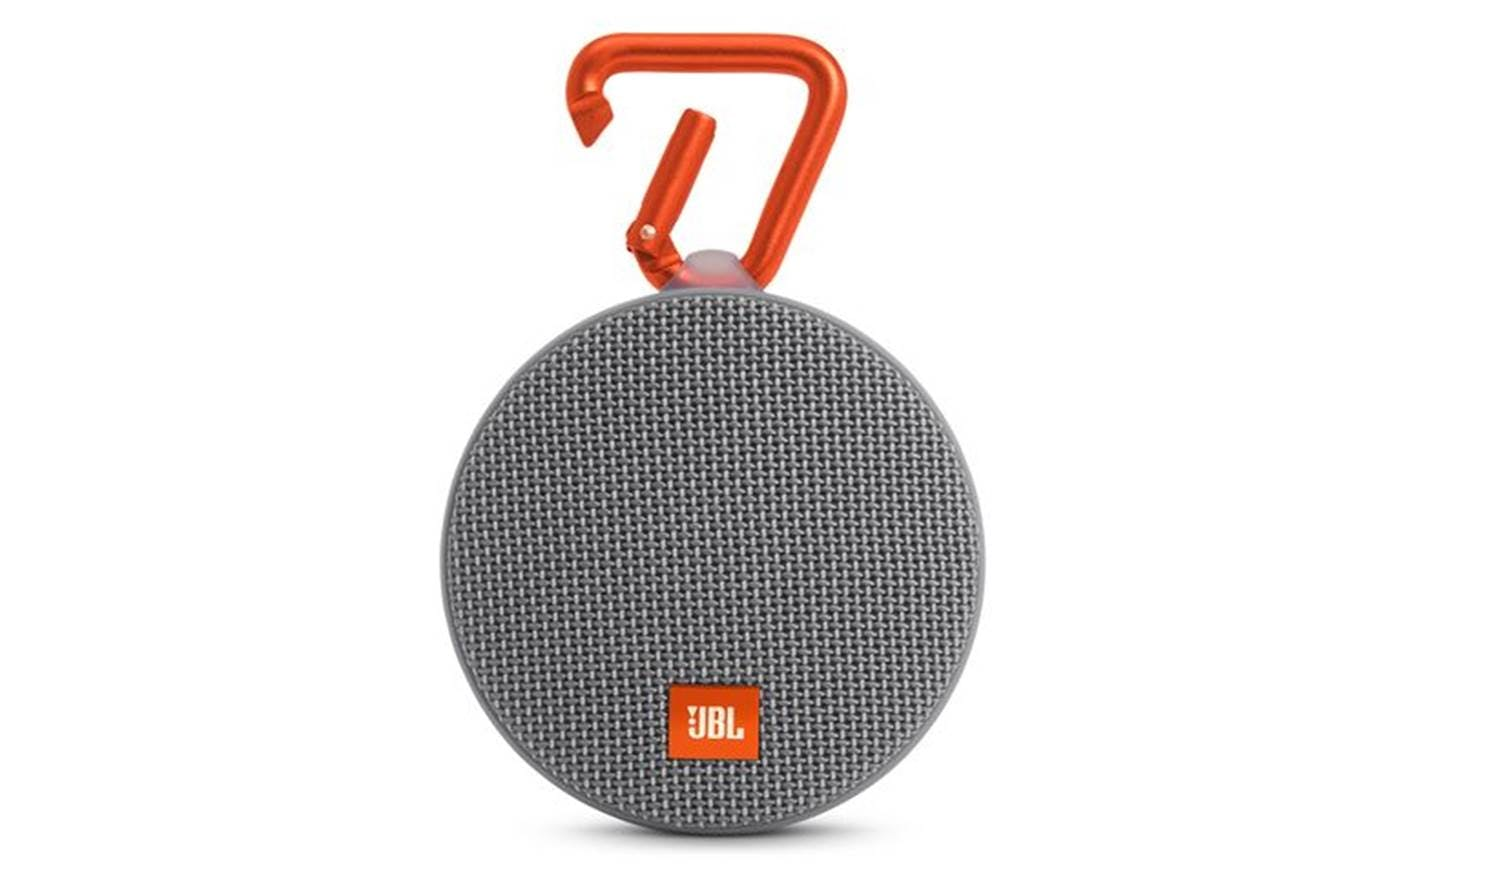 jbl clip ii portable bluetooth speaker grey harvey norman singapore. Black Bedroom Furniture Sets. Home Design Ideas